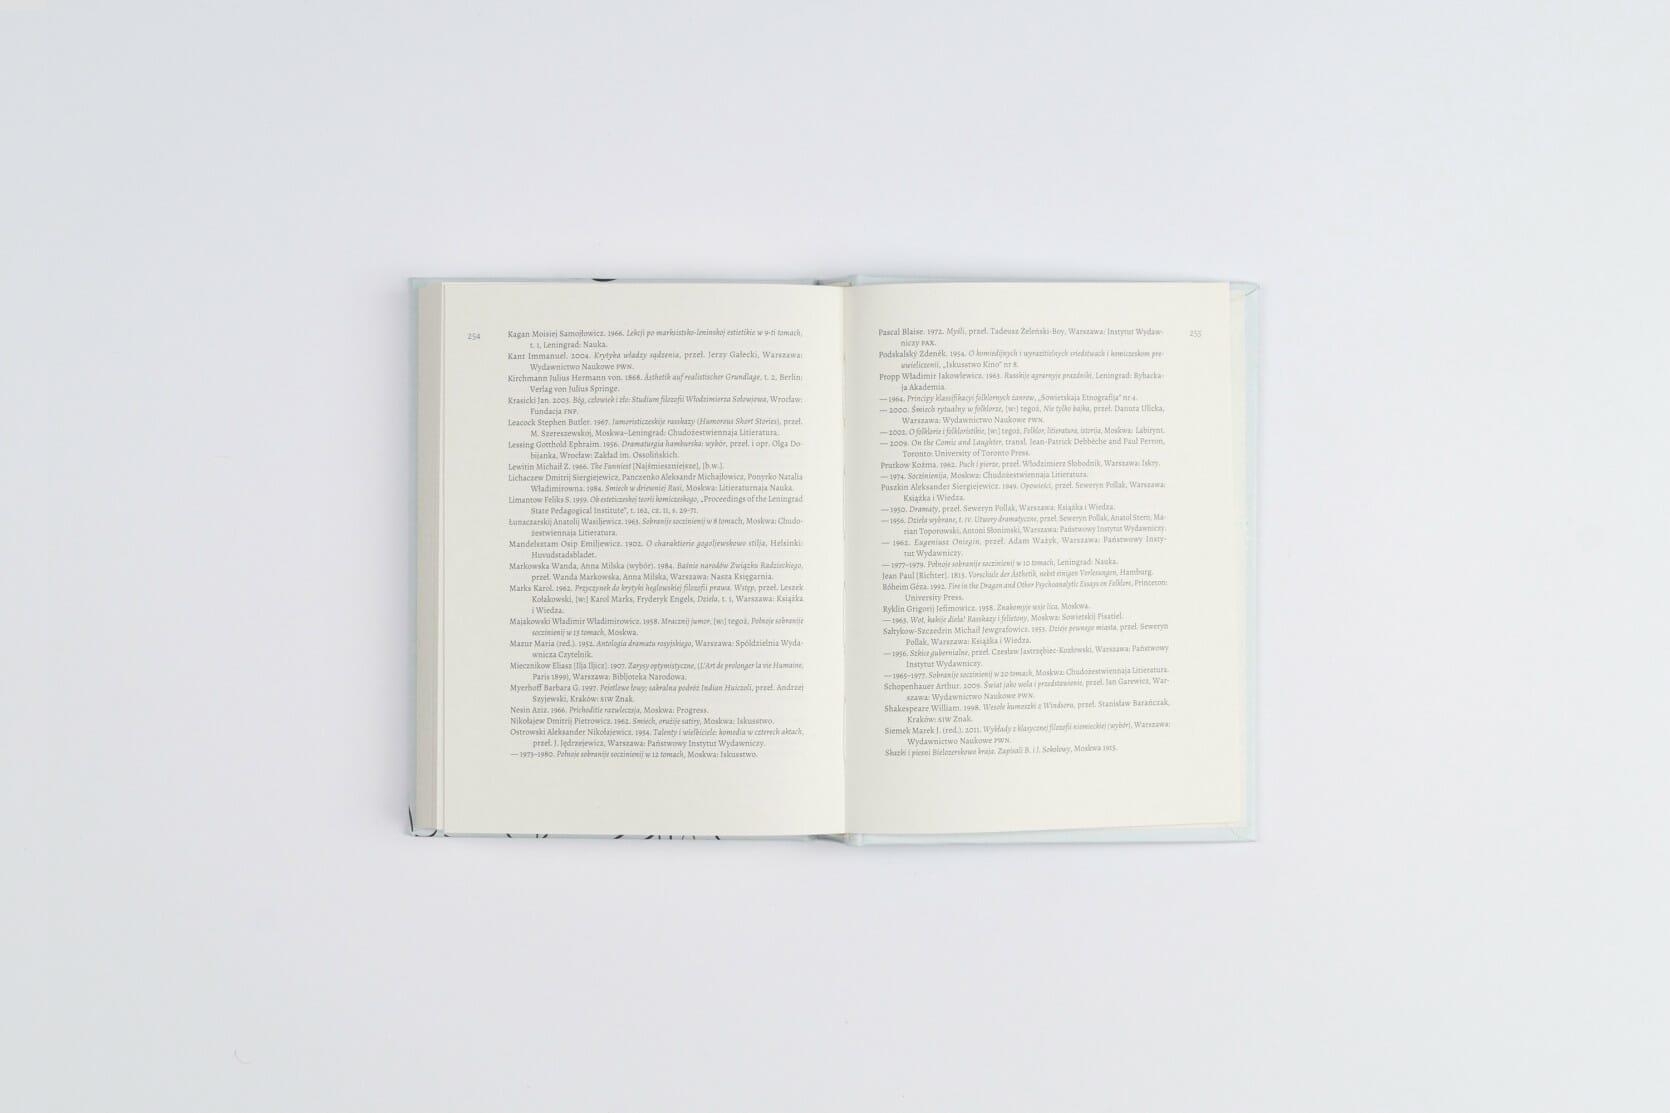 Book design - layout